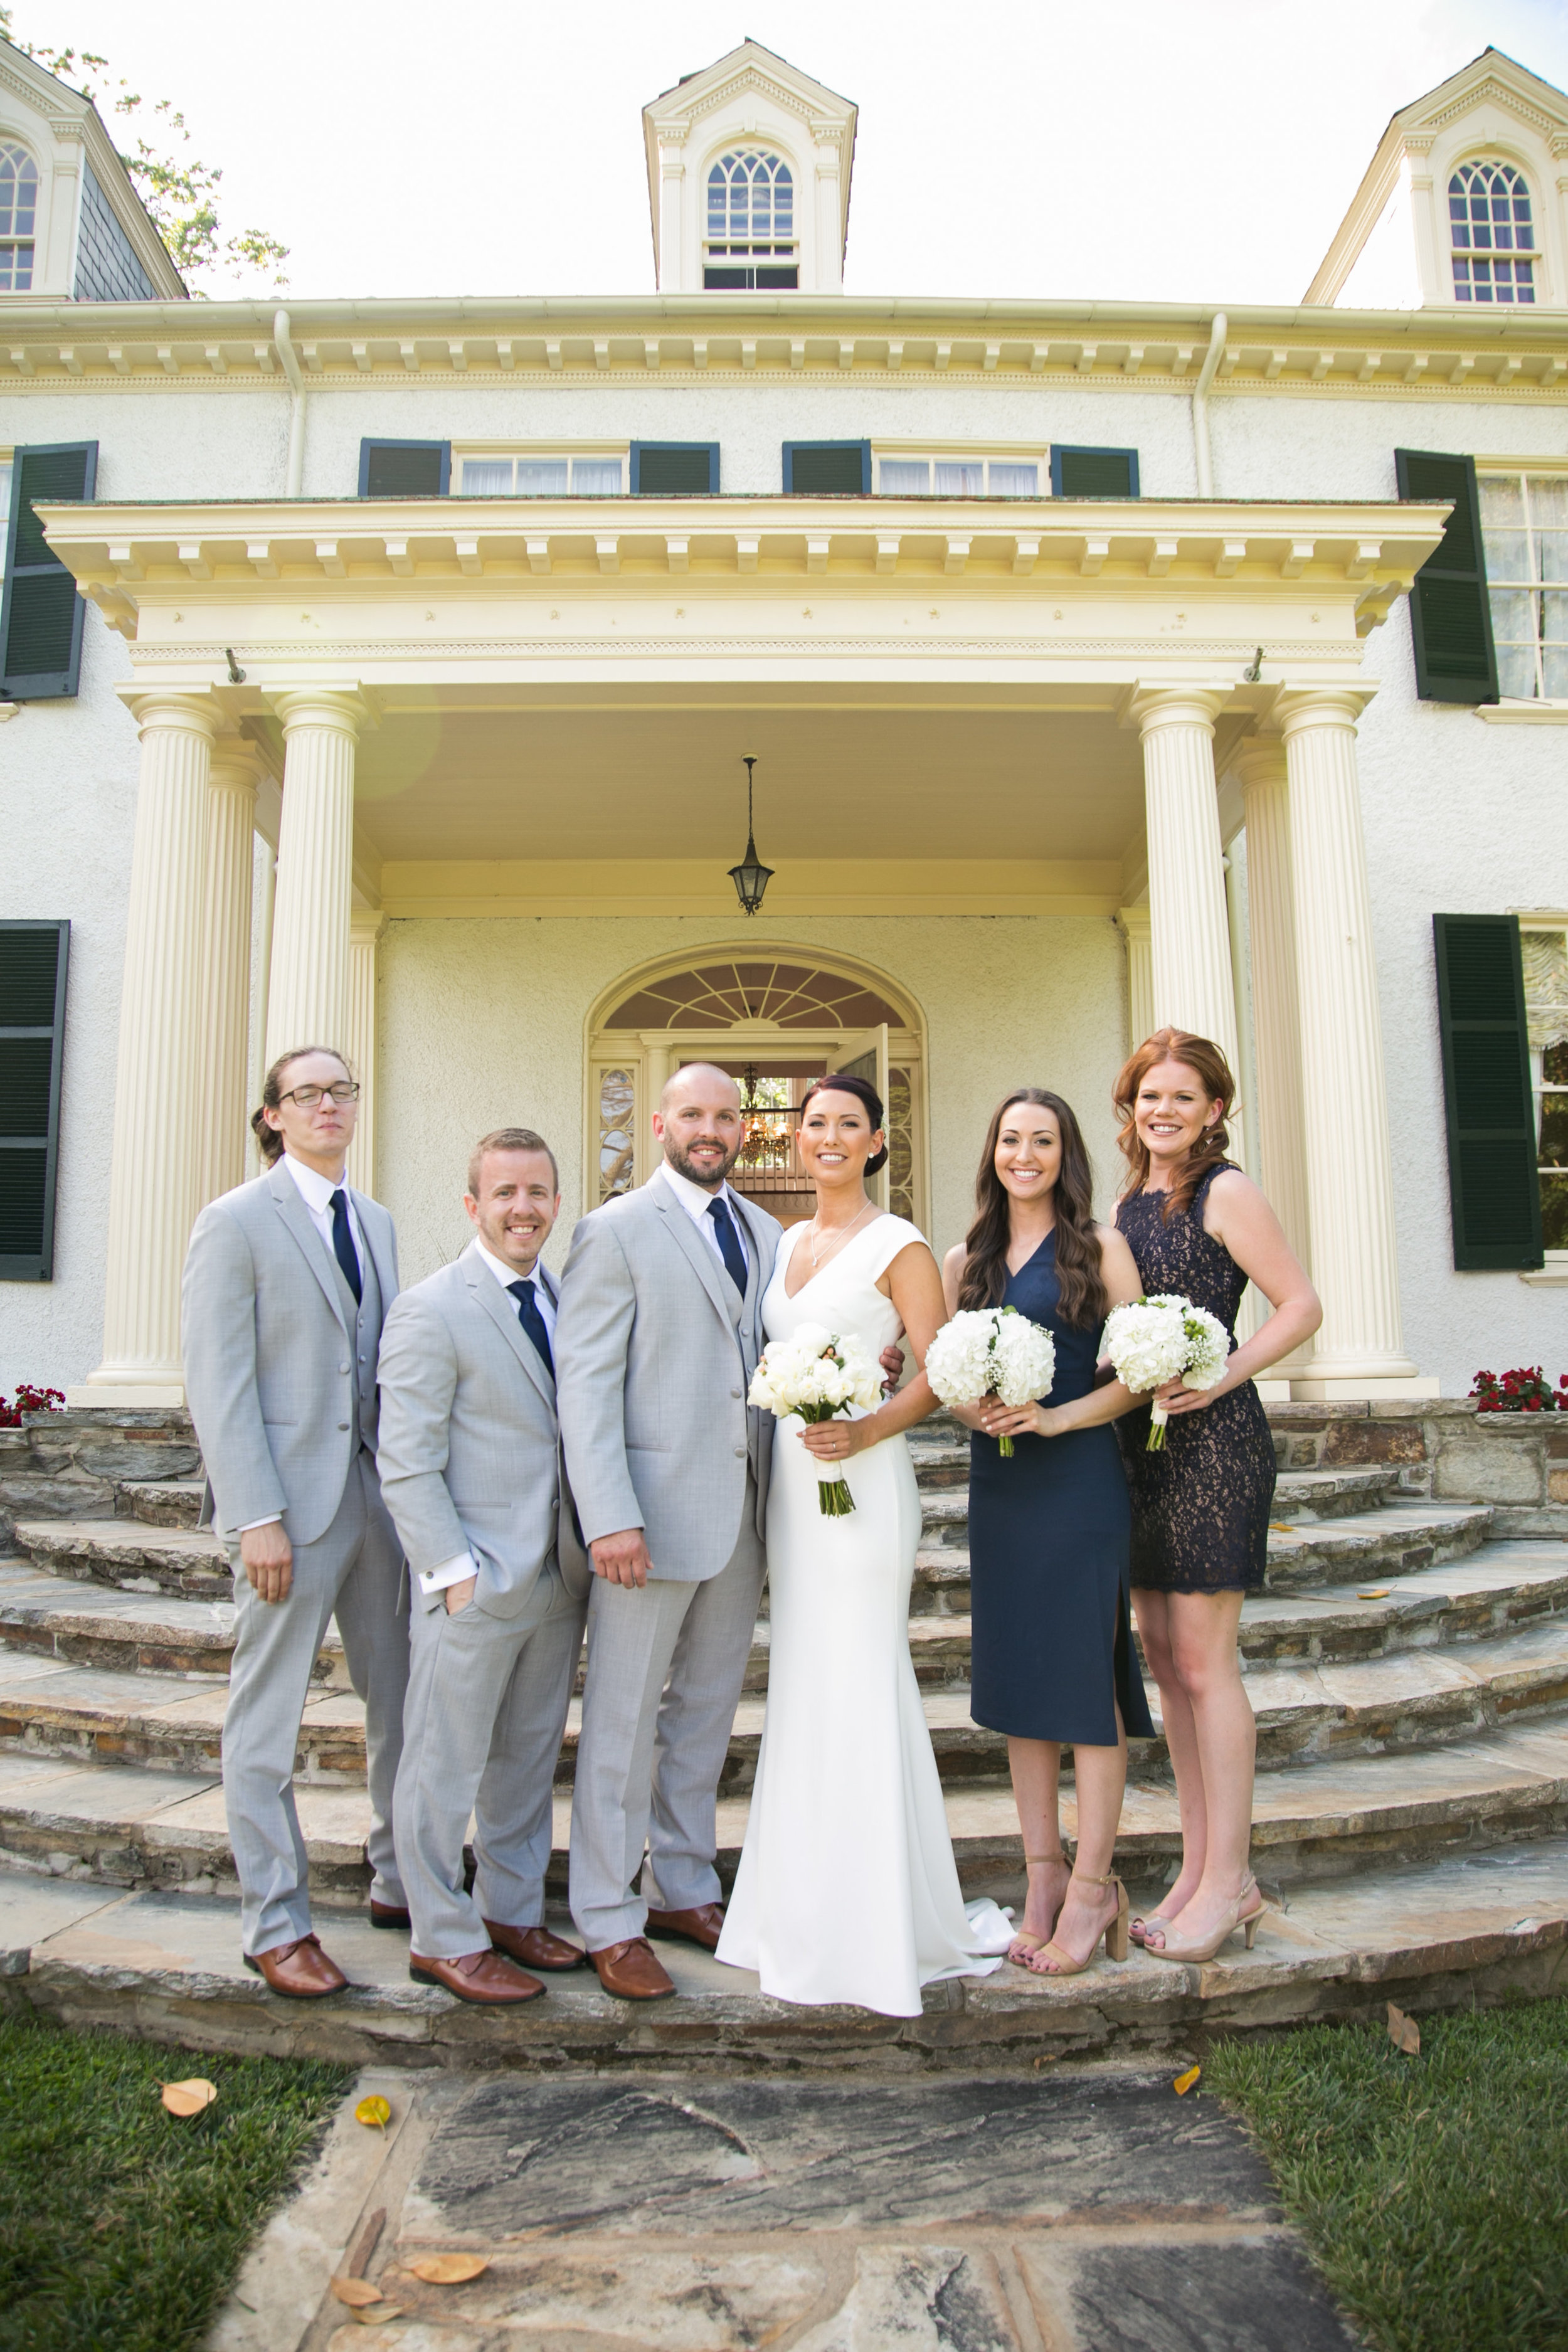 Pure elegance events Tynise Kee dc wedding planner va wedding planner rust manor house leesburg -0047.jpg